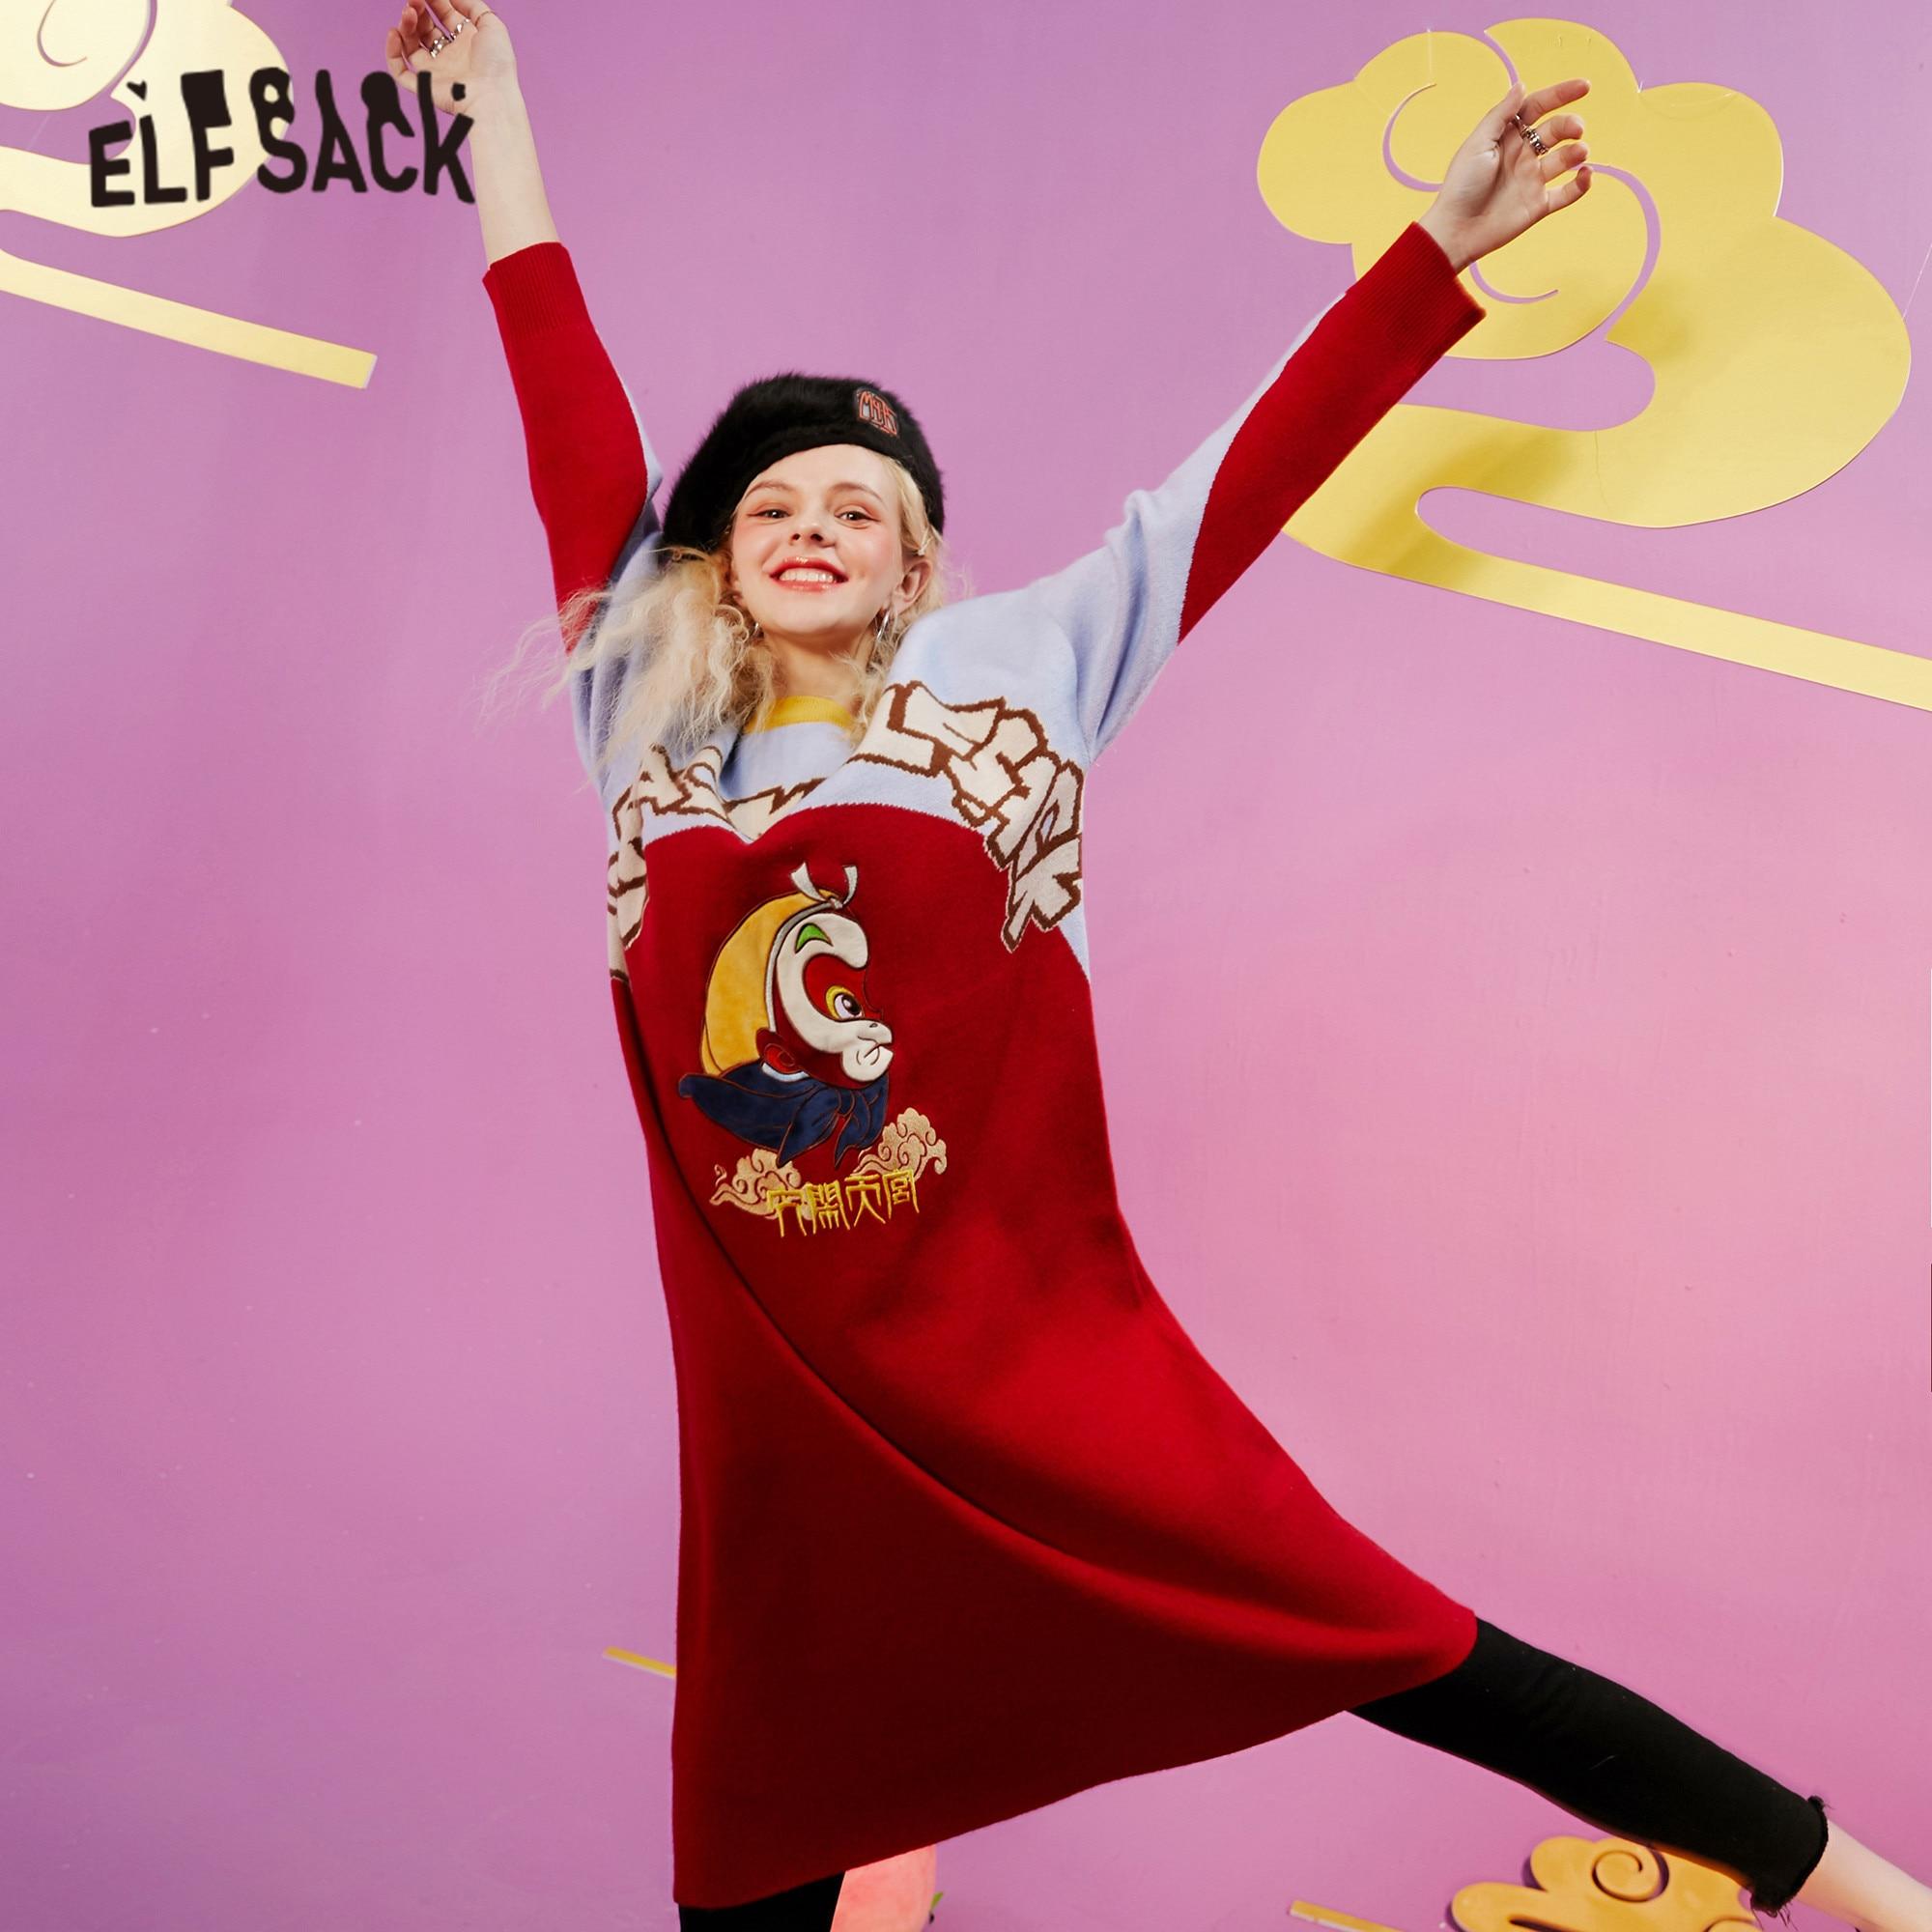 ELFSACK-فستان منسوج عتيق بخصر عالٍ للنساء ، فستان بنمط كرتوني ، مجموعة ربيع 2021